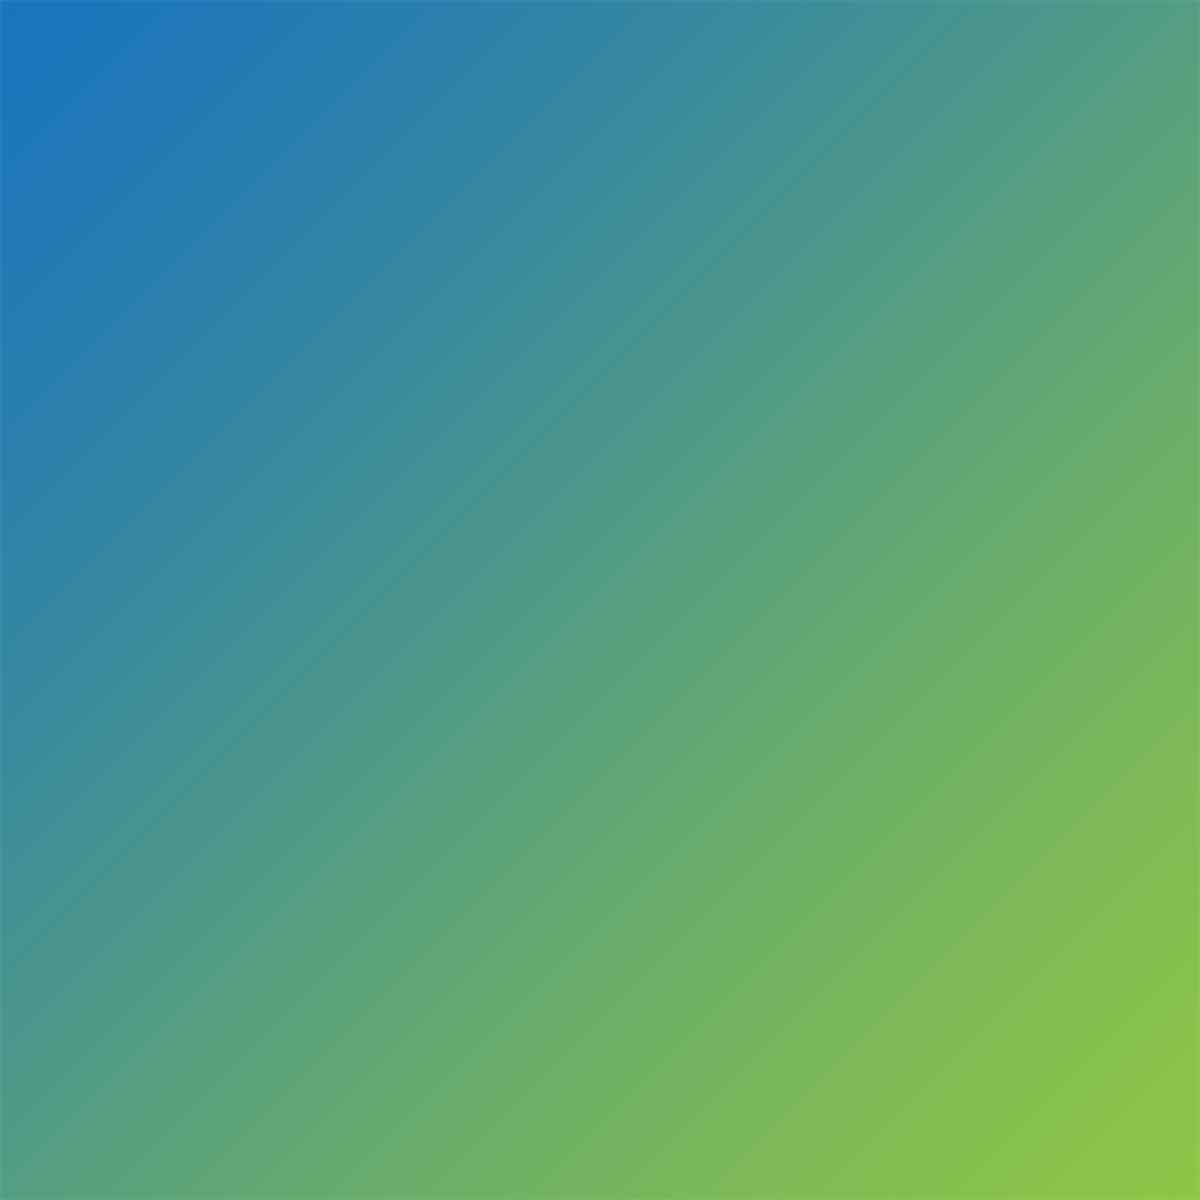 https://www.lukart.cz/wp-content/uploads/2018/09/bgn-image-box-gradient.jpg